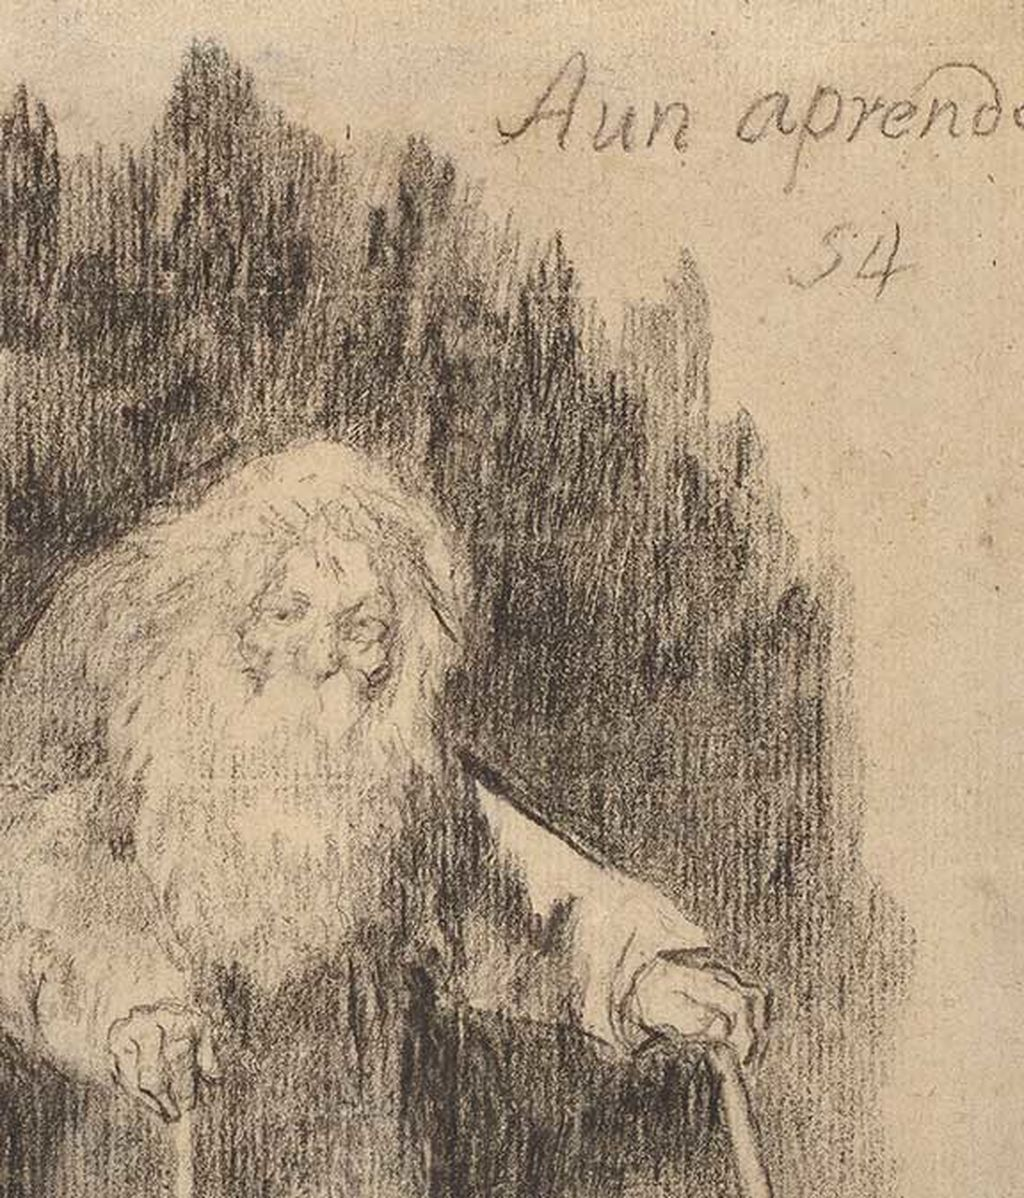 Dibujo de Francisco de Goya